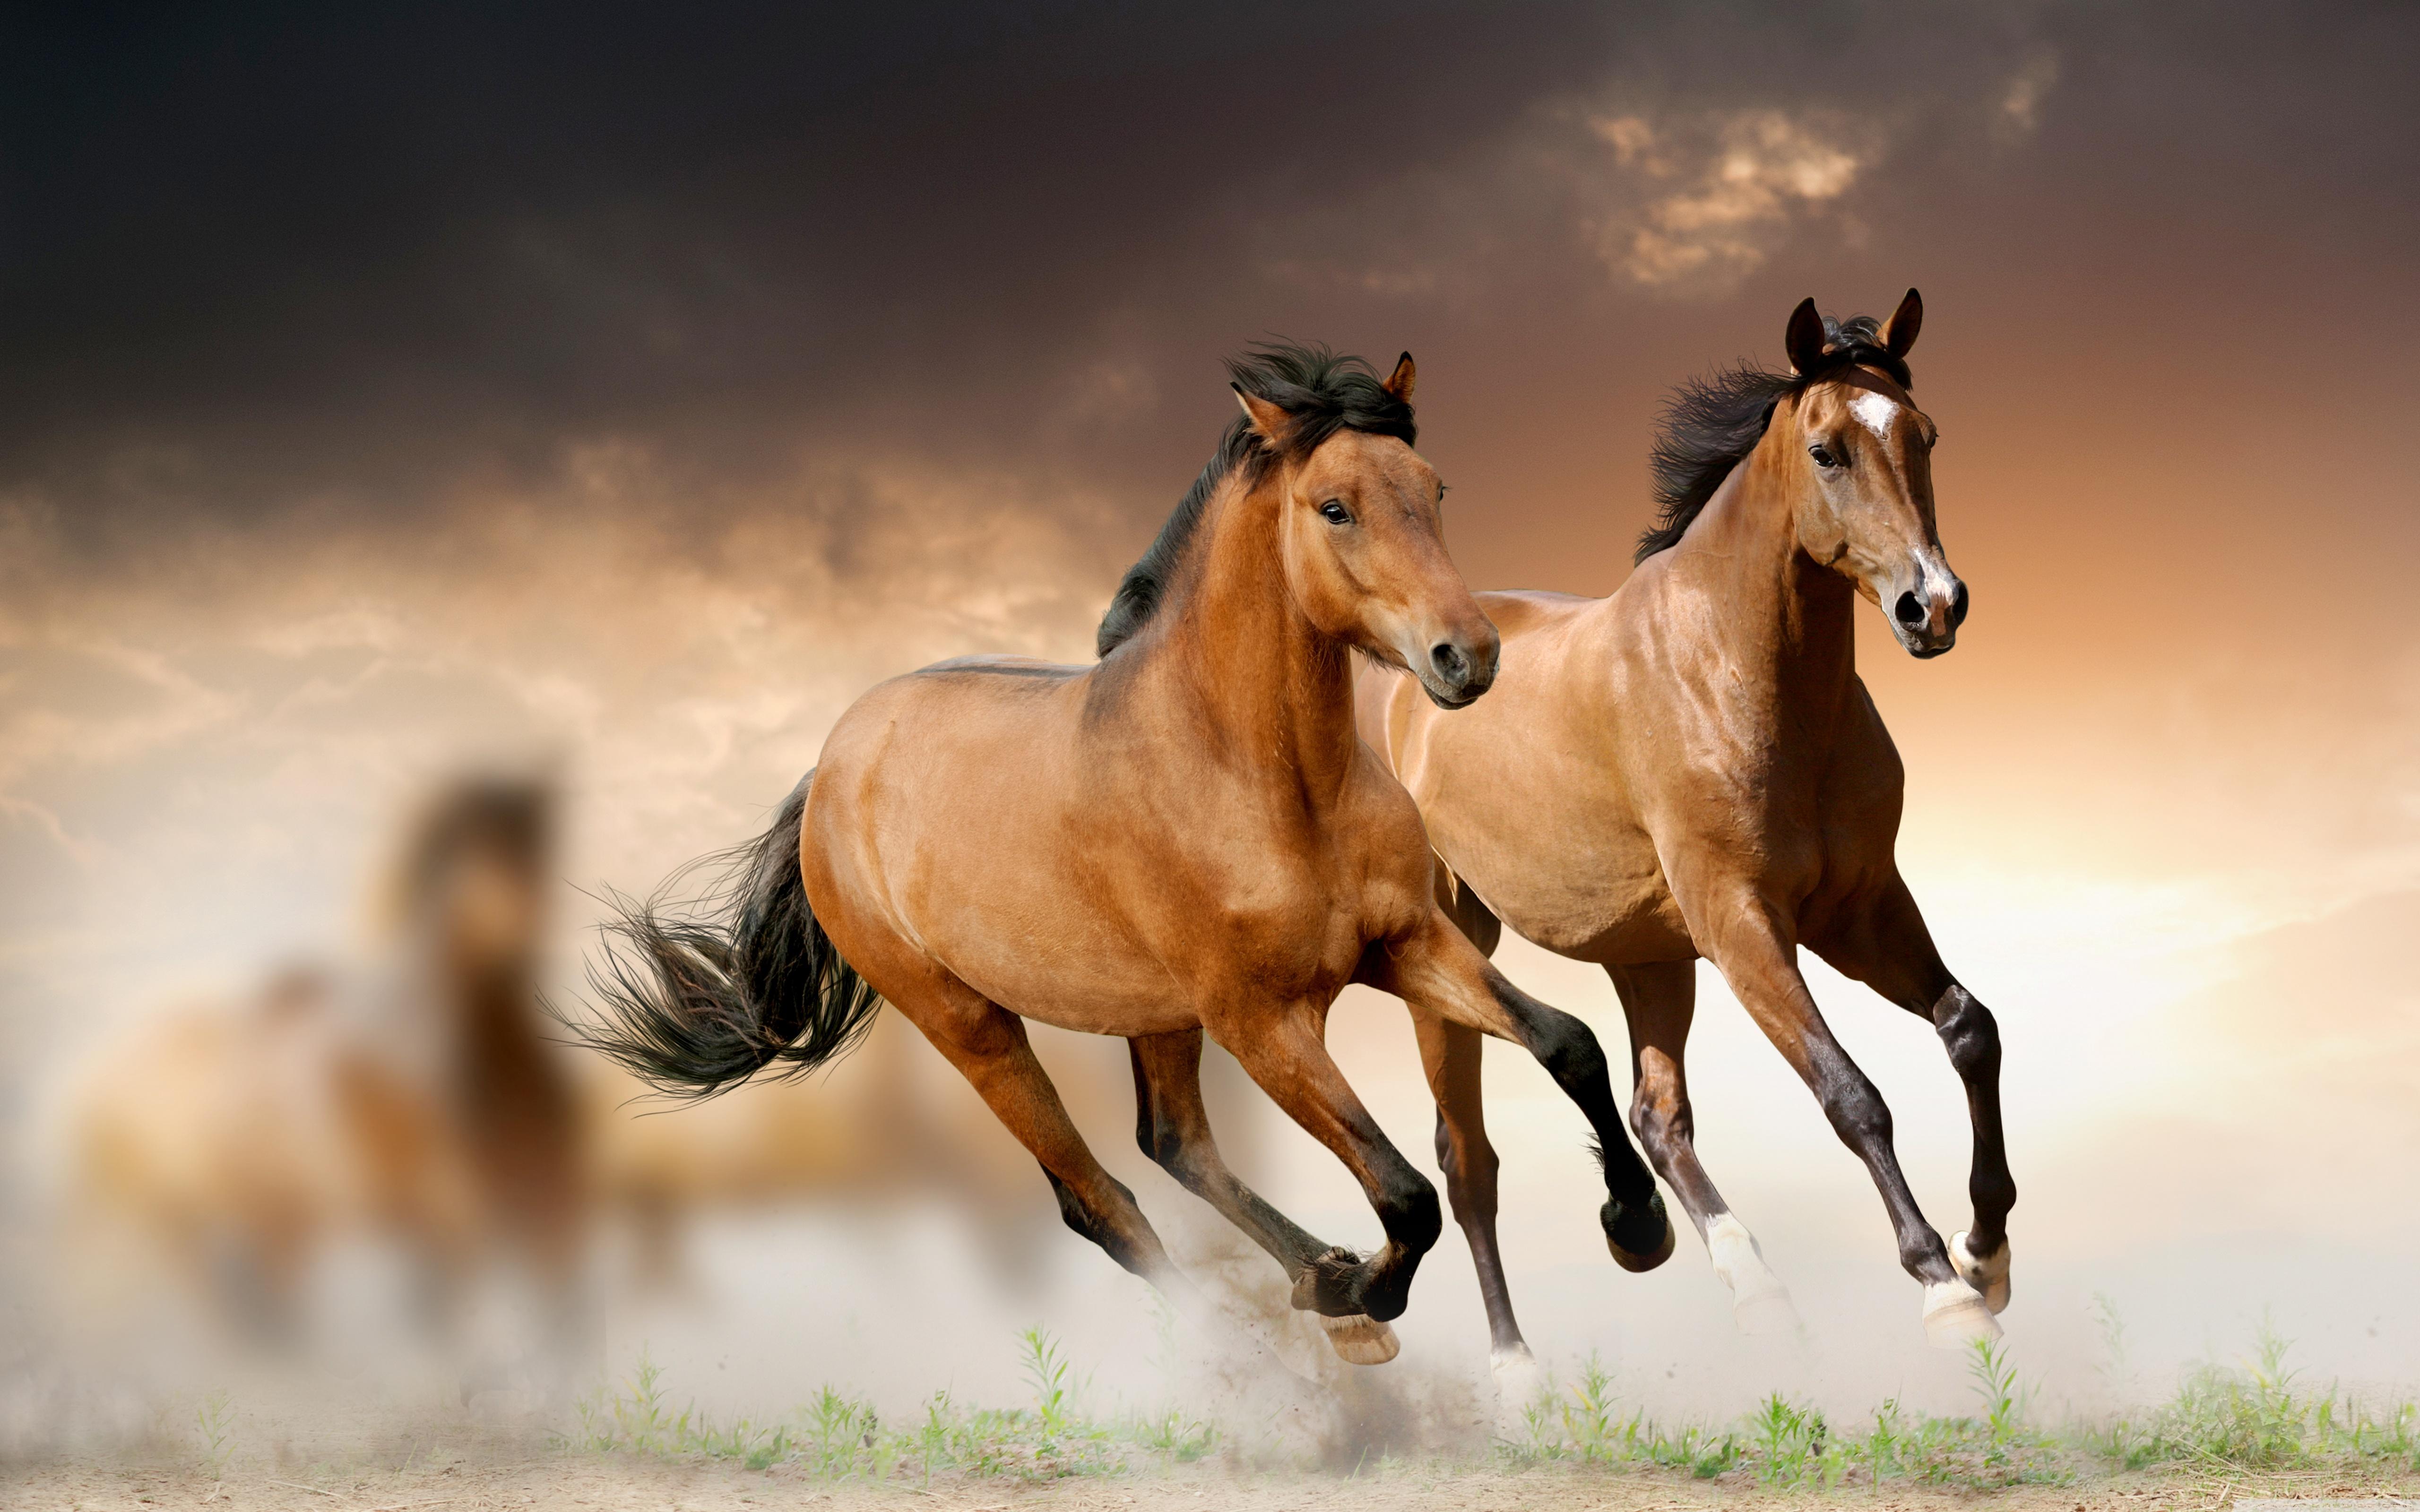 Horses Running 4K HD Desktop Wallpaper for 4K Ultra HD TV 5120x3200